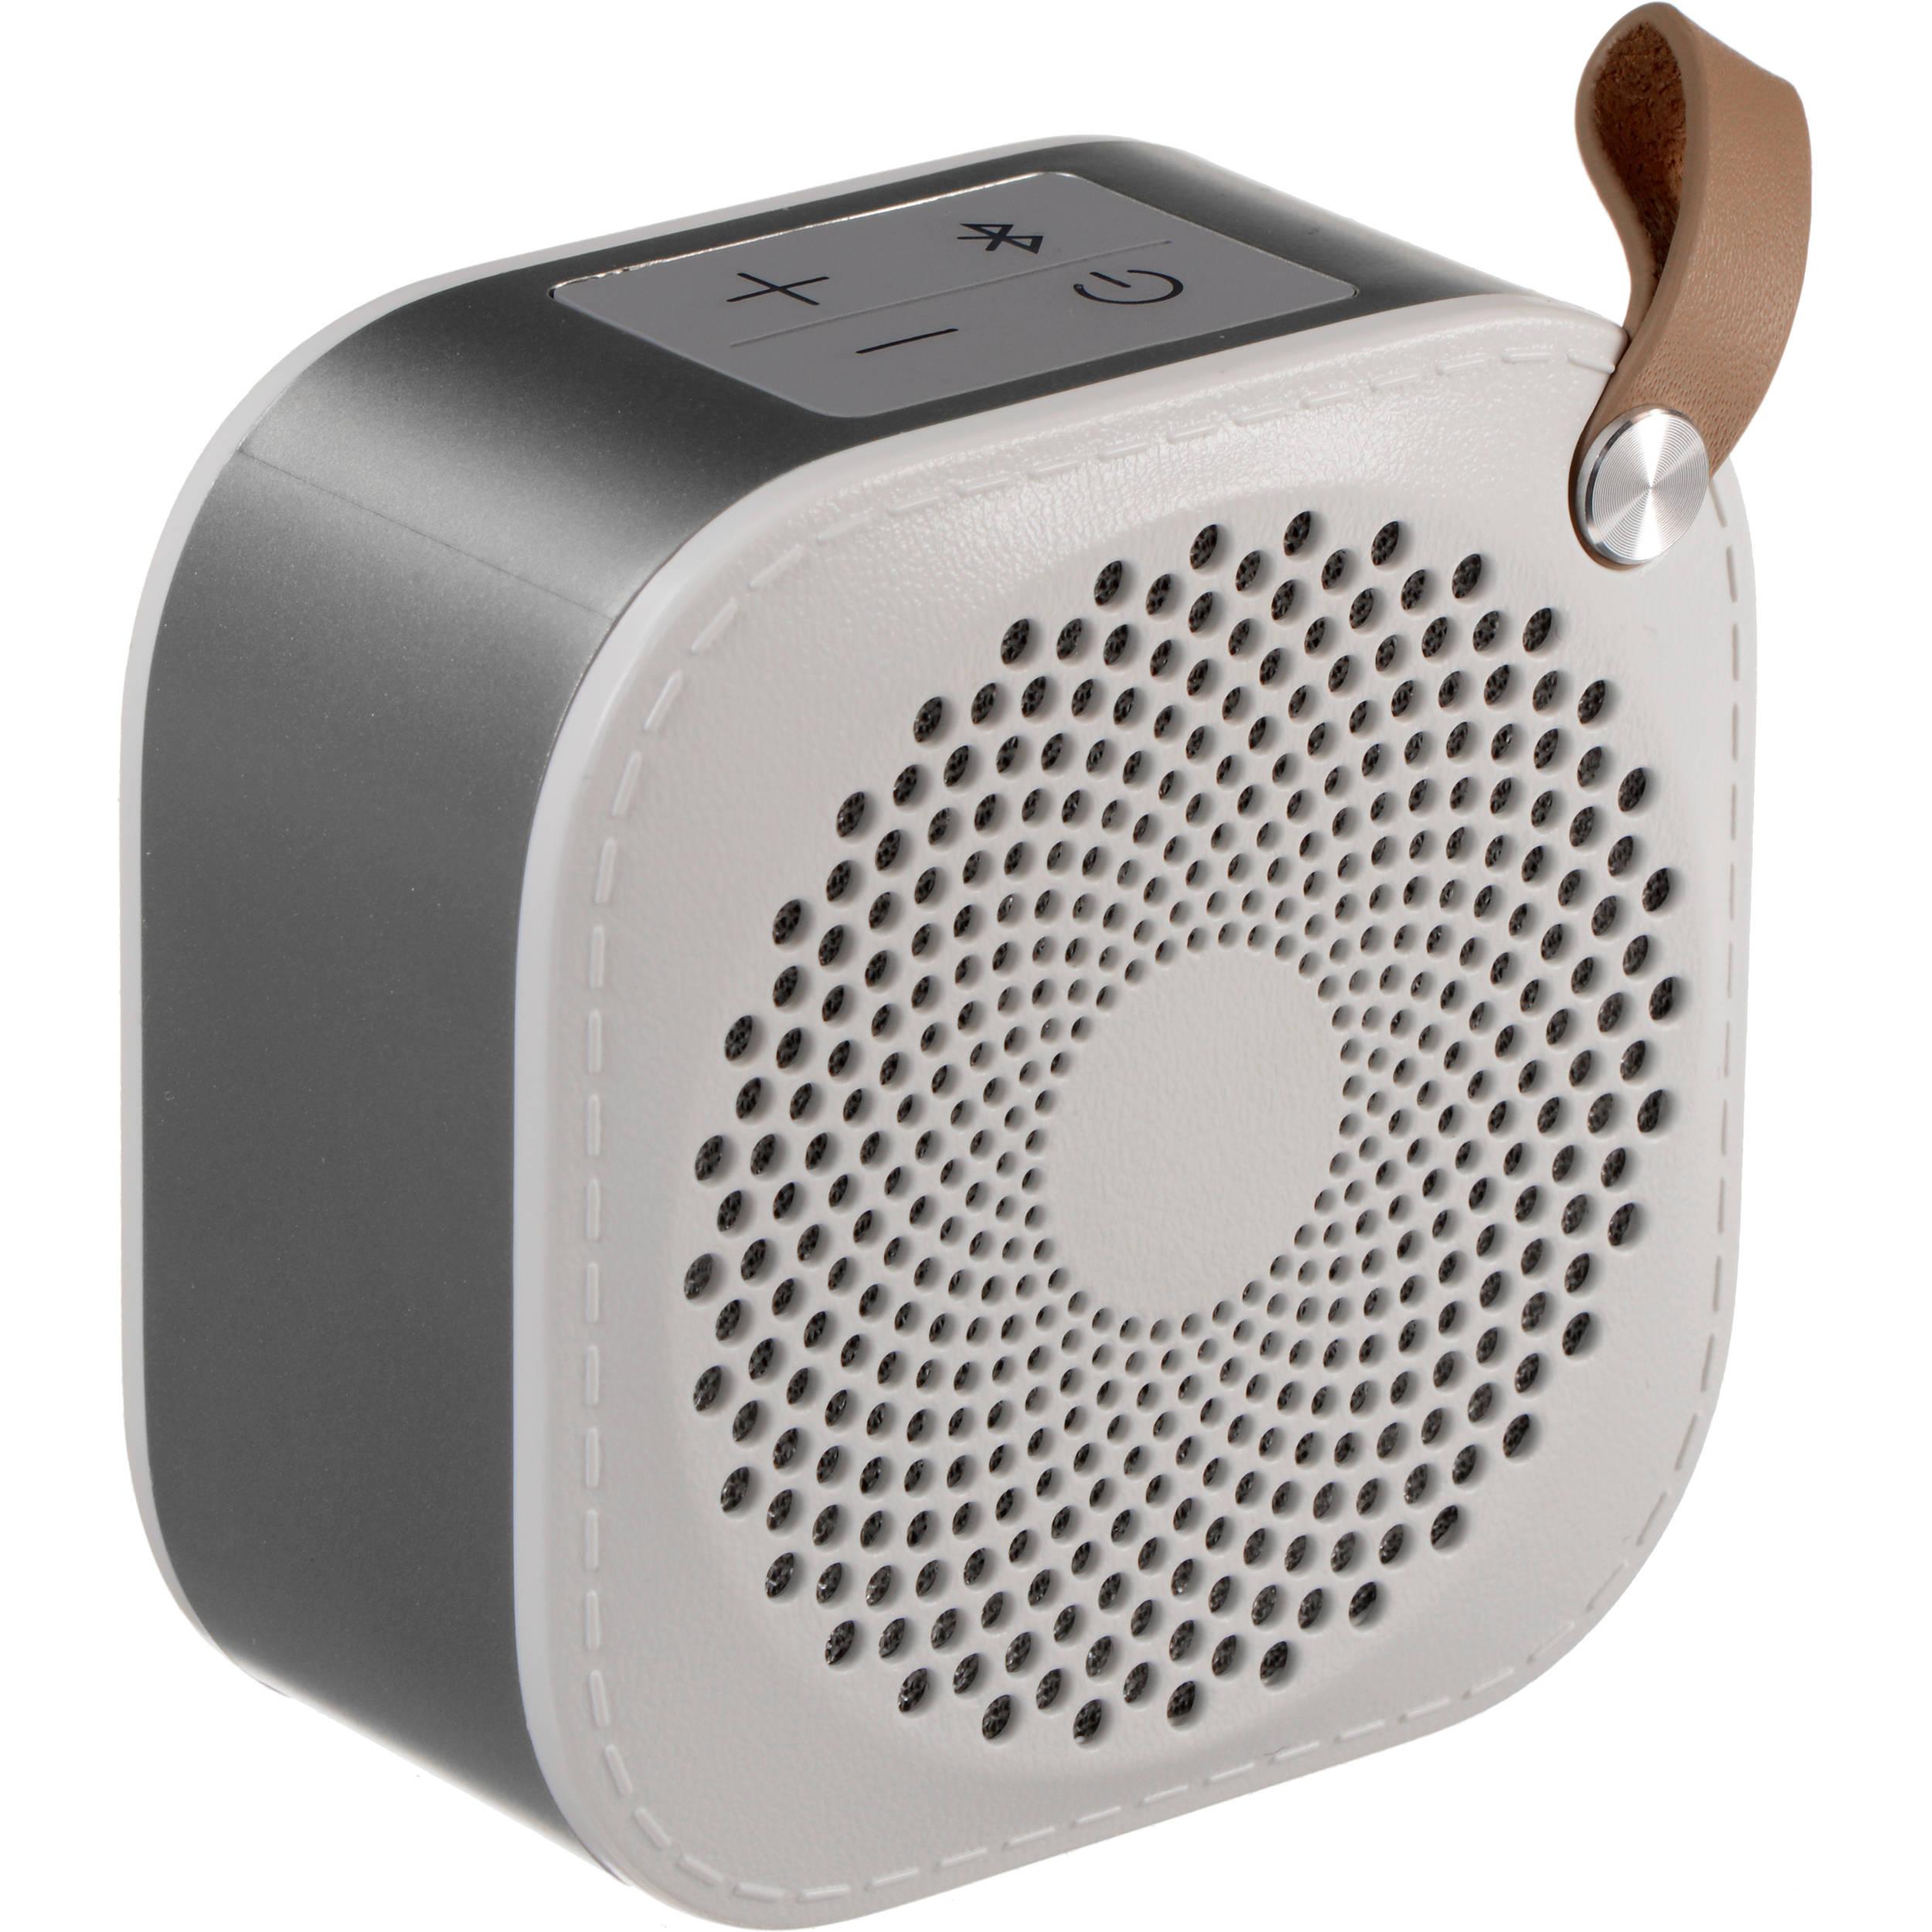 Hitachi BTN8 Portable Bluetooth Speaker (White, Small)